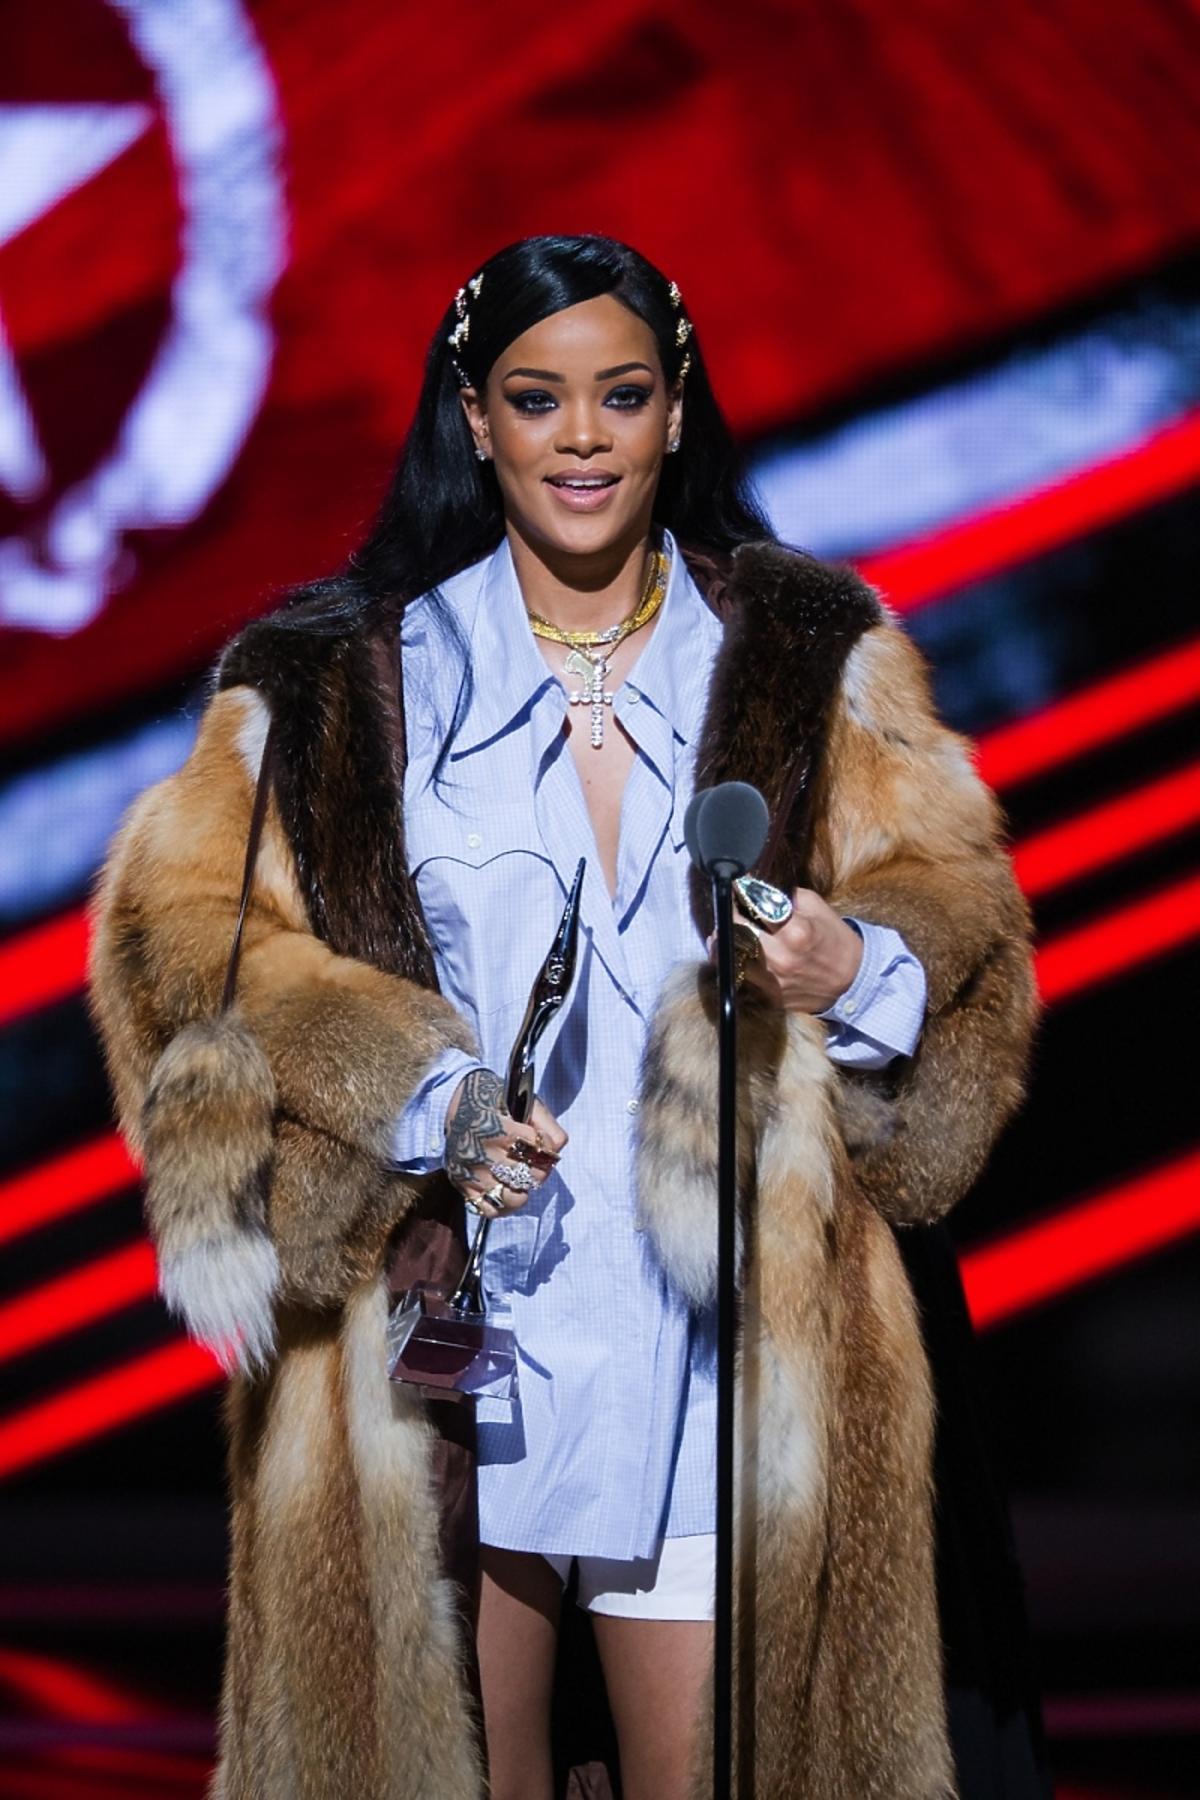 Rihanna w koszuli, szortach i futrach